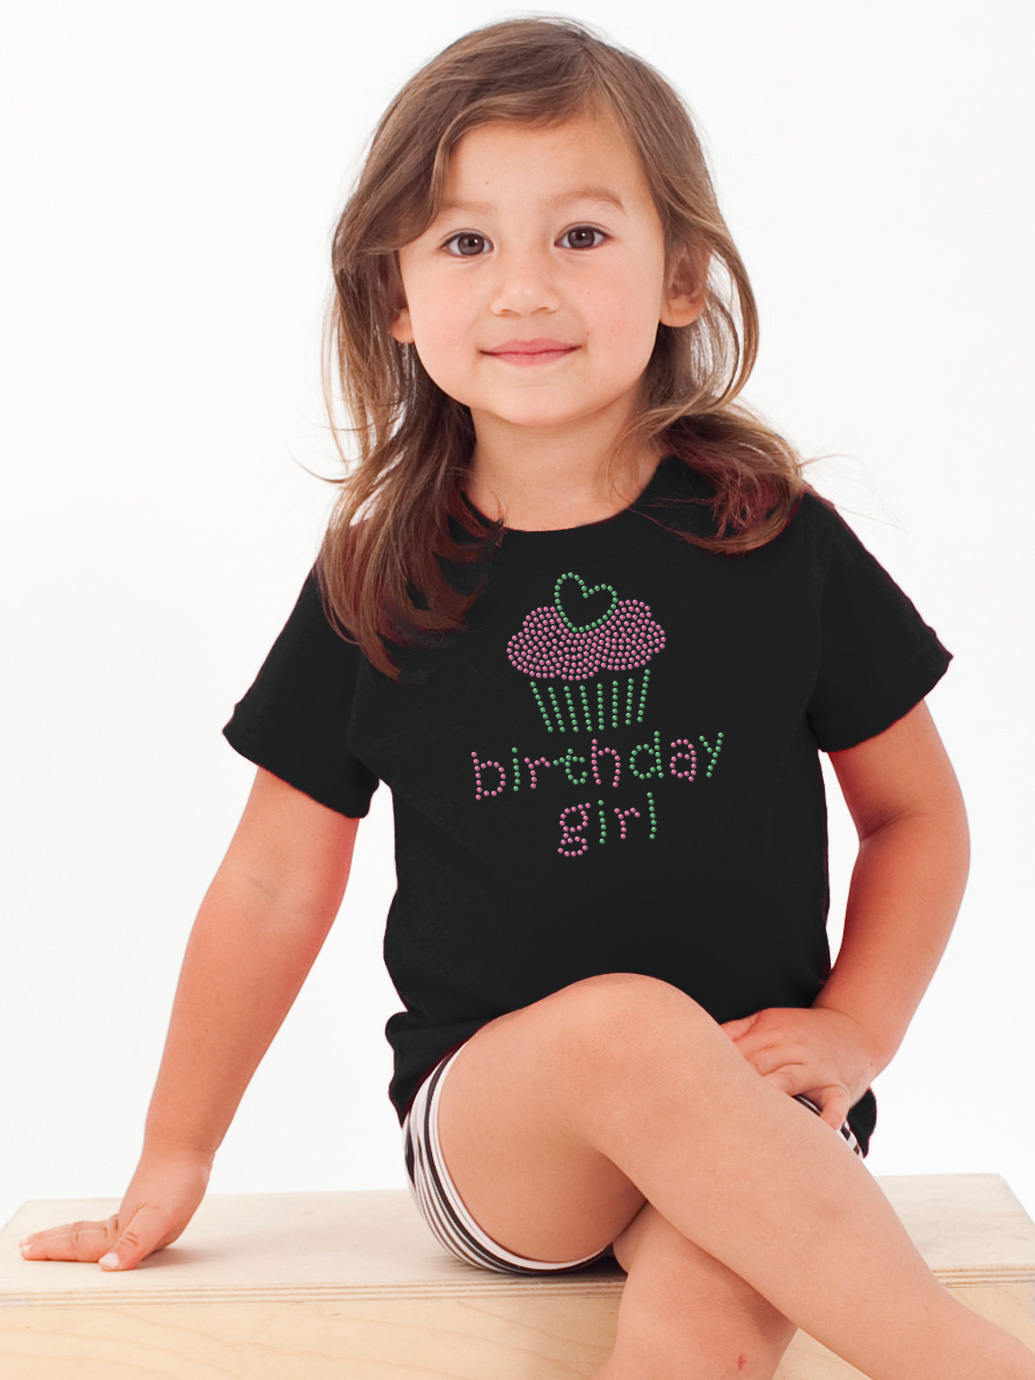 Birthday Girl Pre Made Single Piece Art Shirt Orders